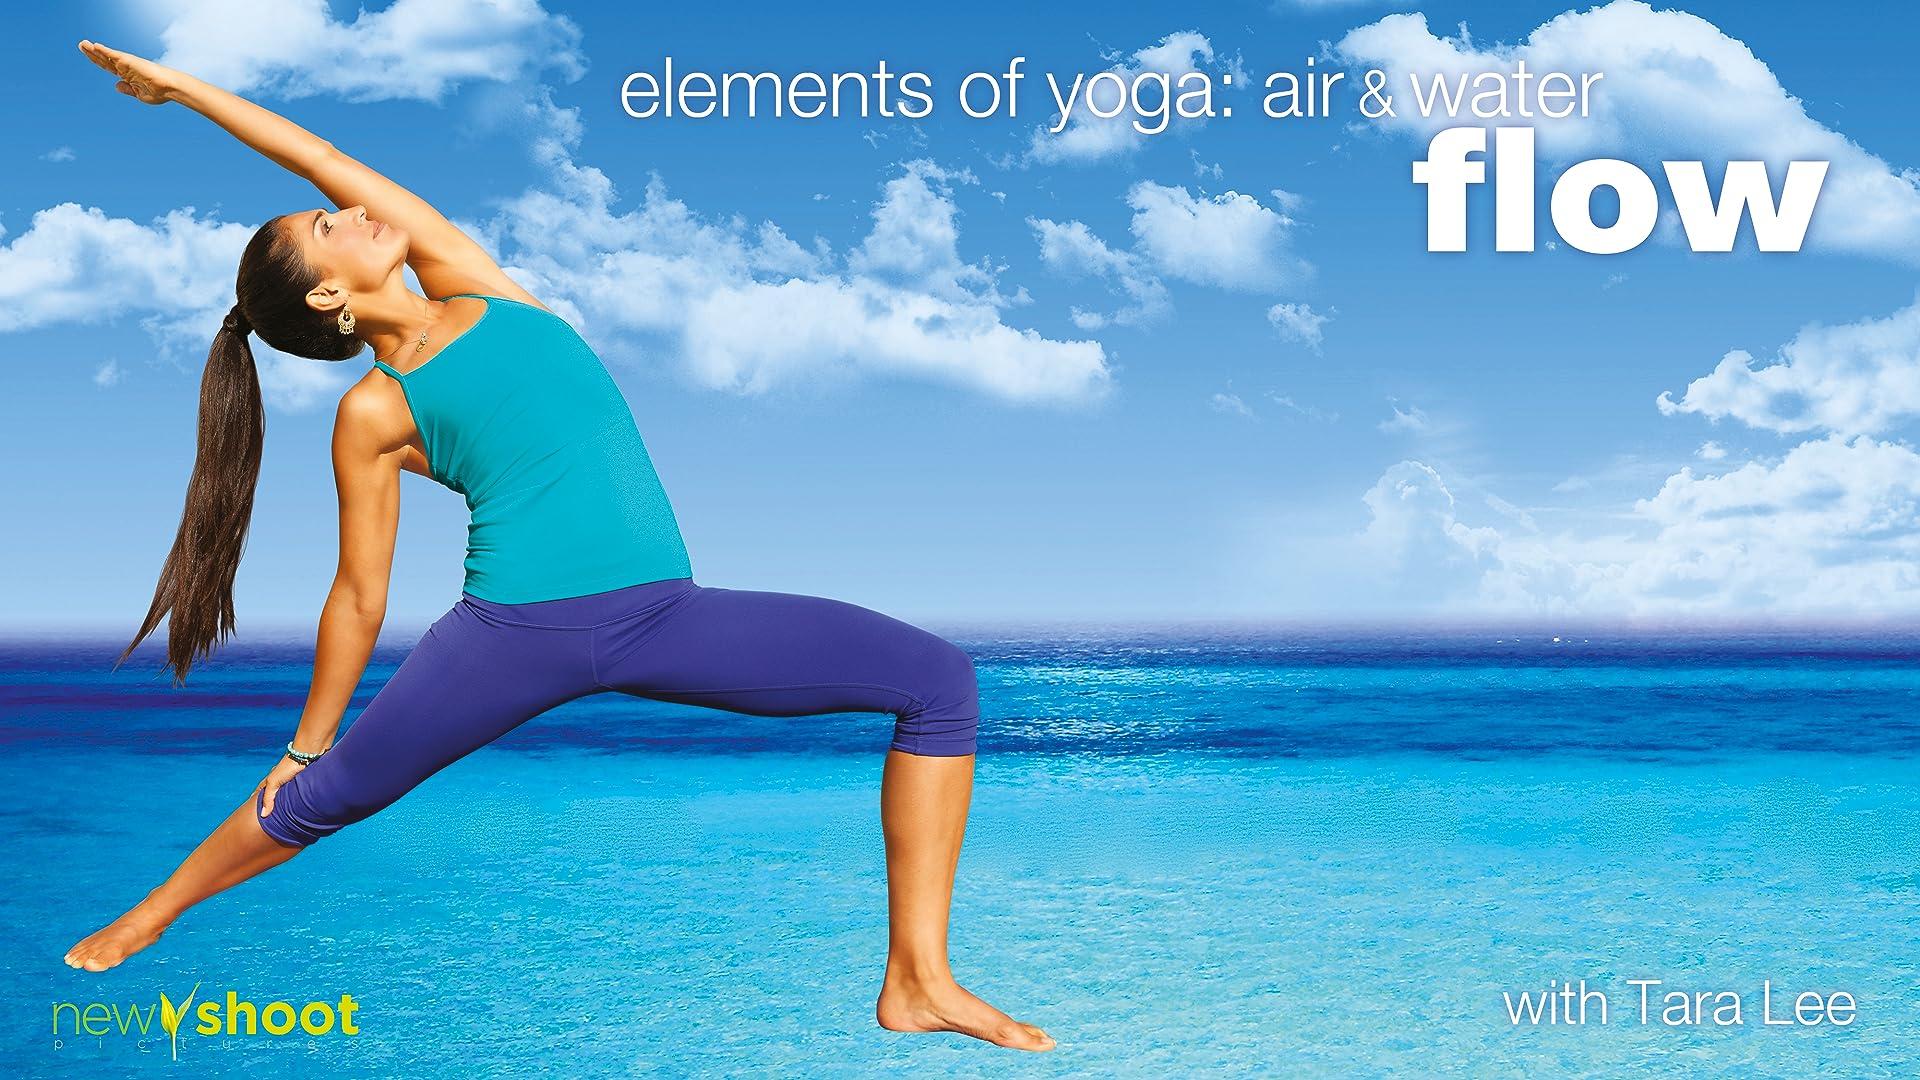 Flow Yoga: Elements of Yoga: Air & Water with Tara Lee